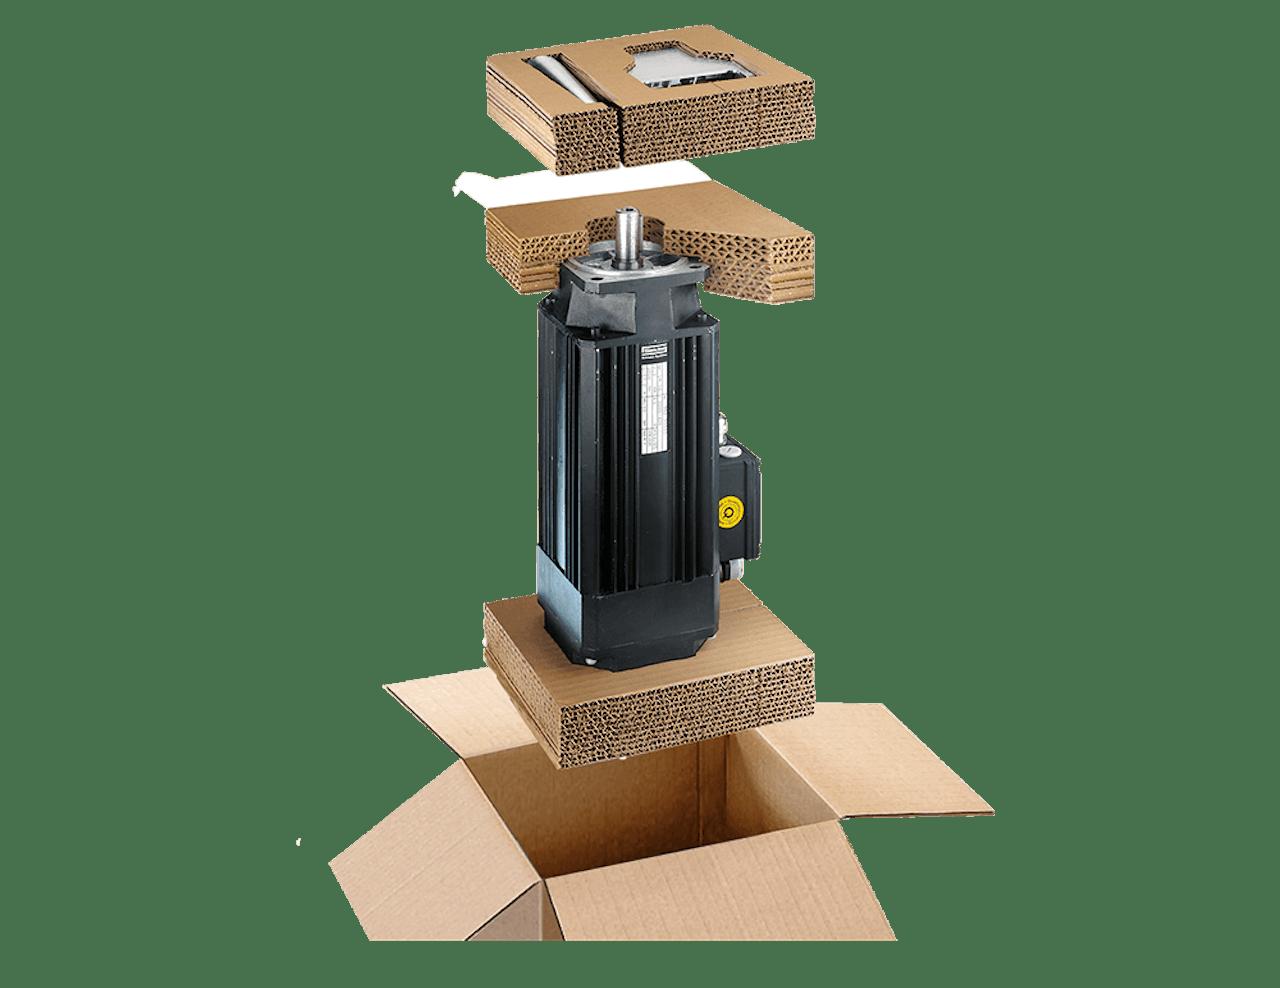 Einstoff Konstruktiv Verpackung